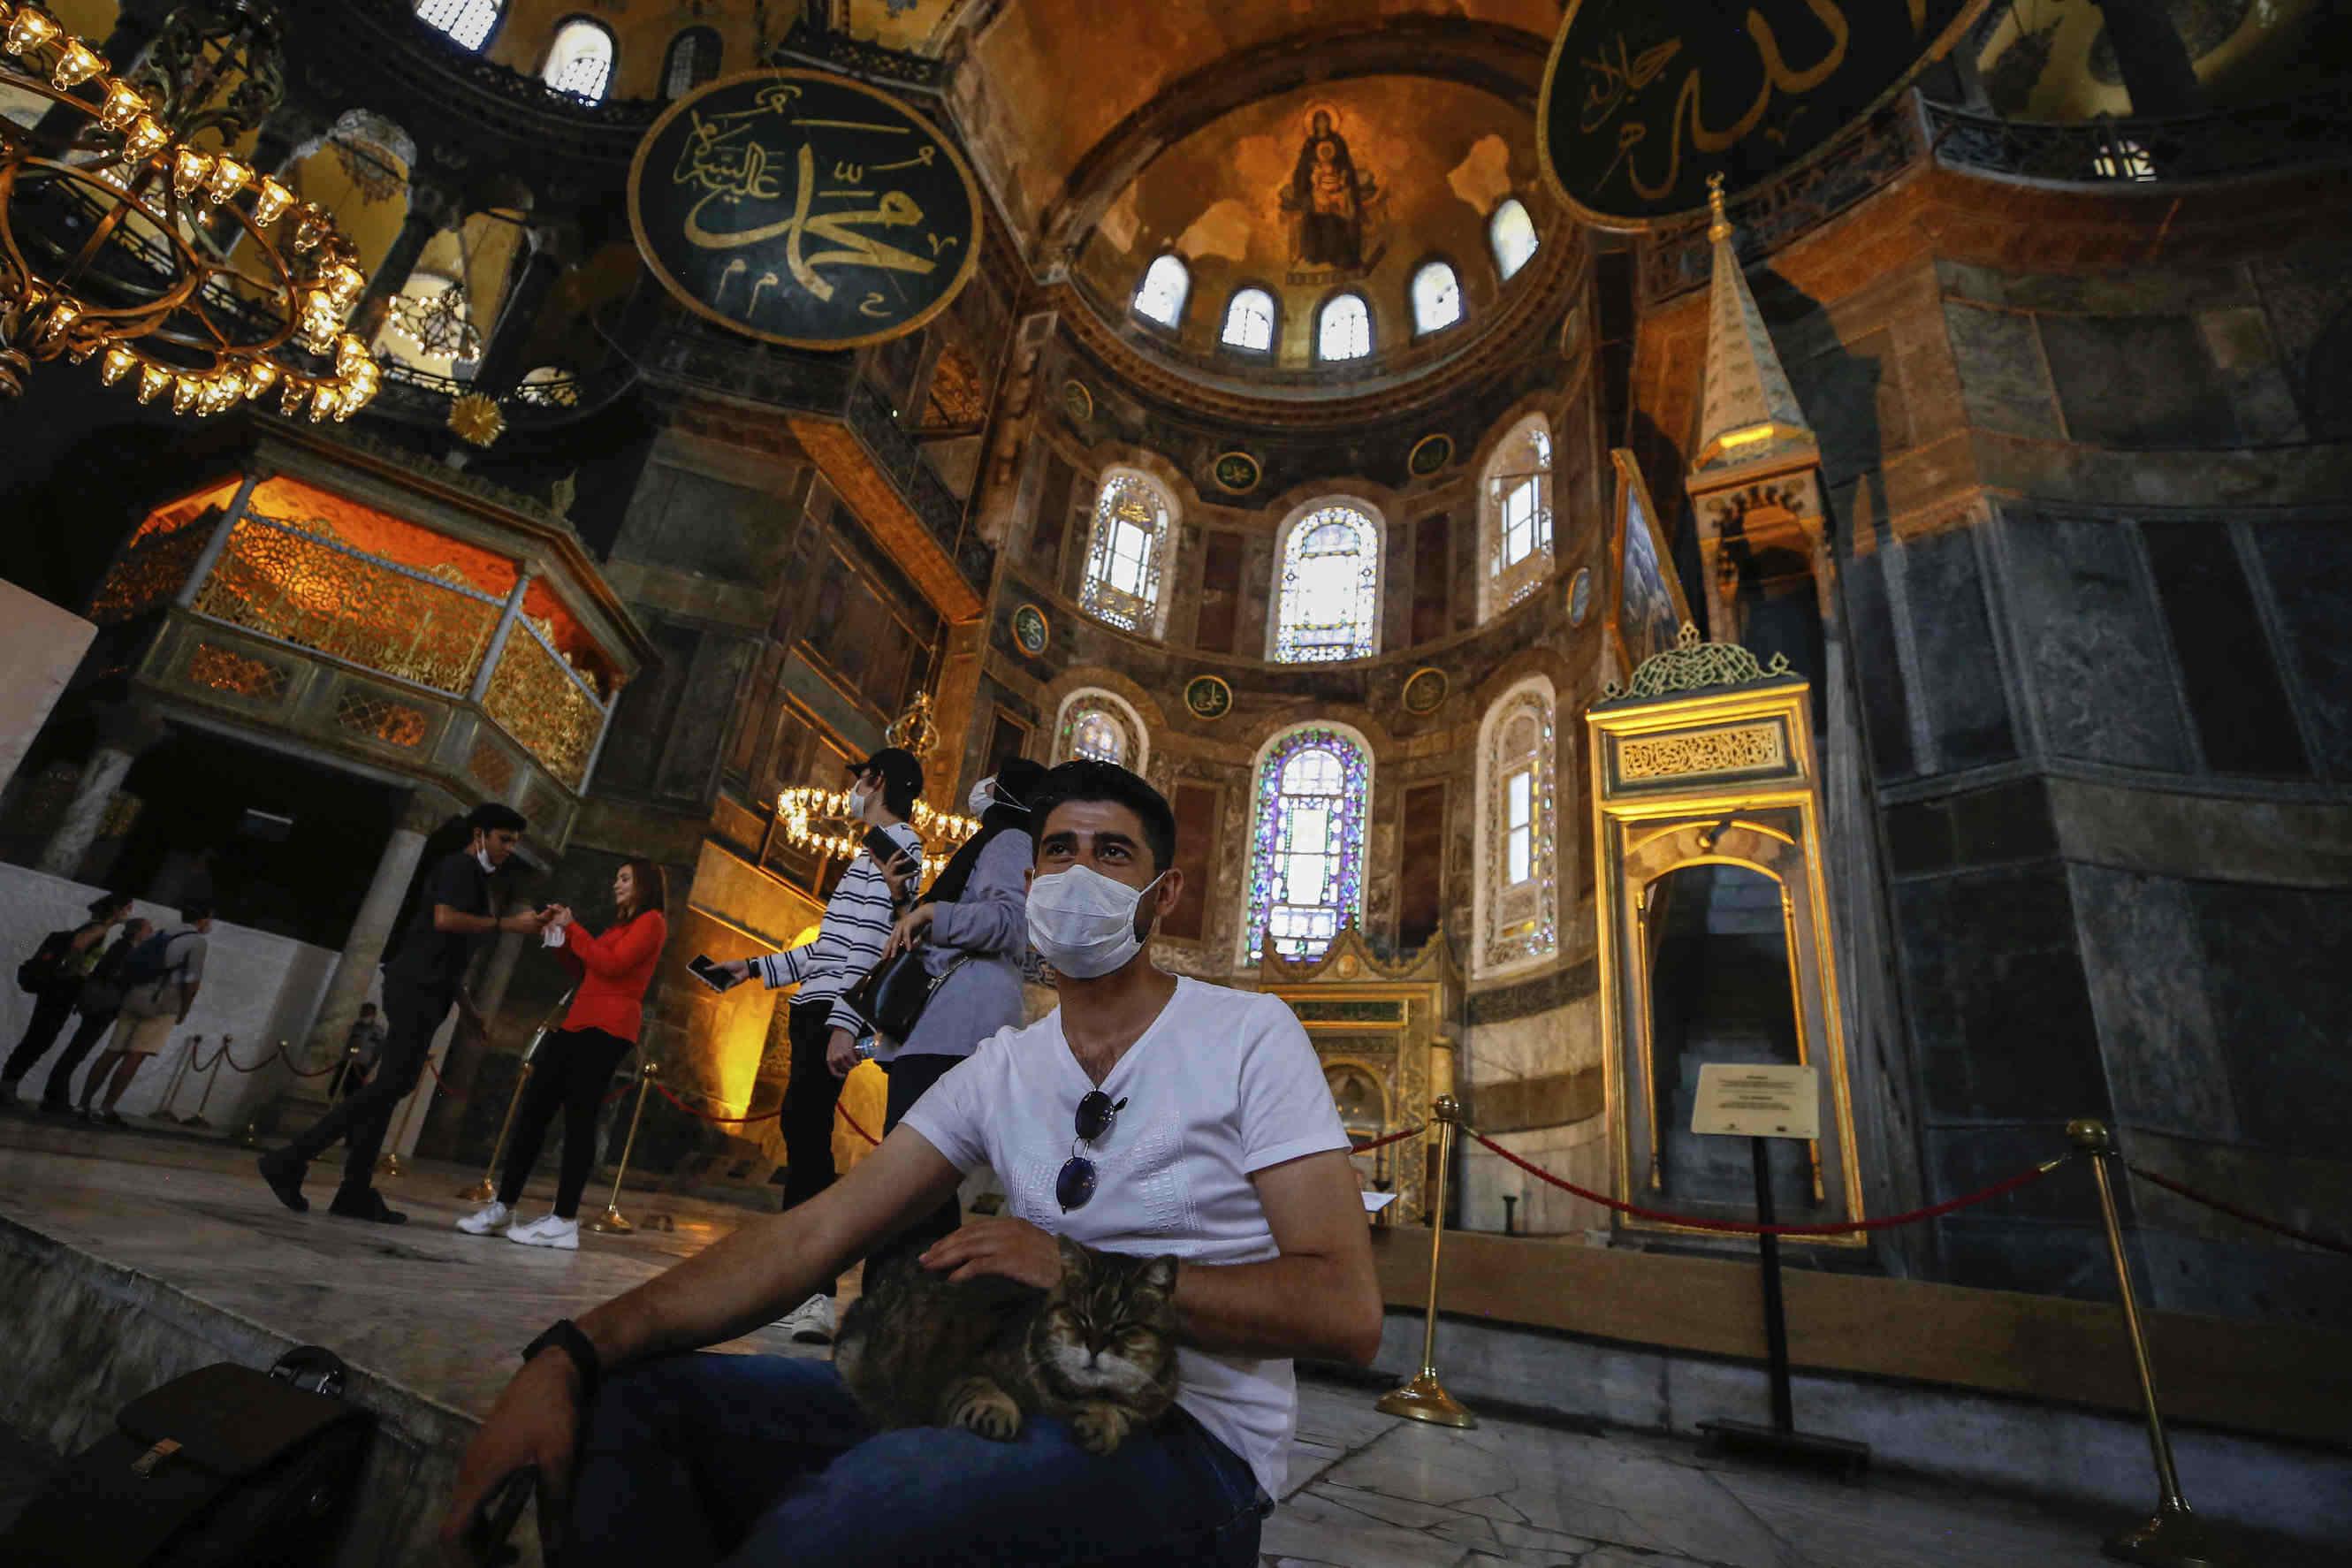 Tourism returns as second half of 2020 begins